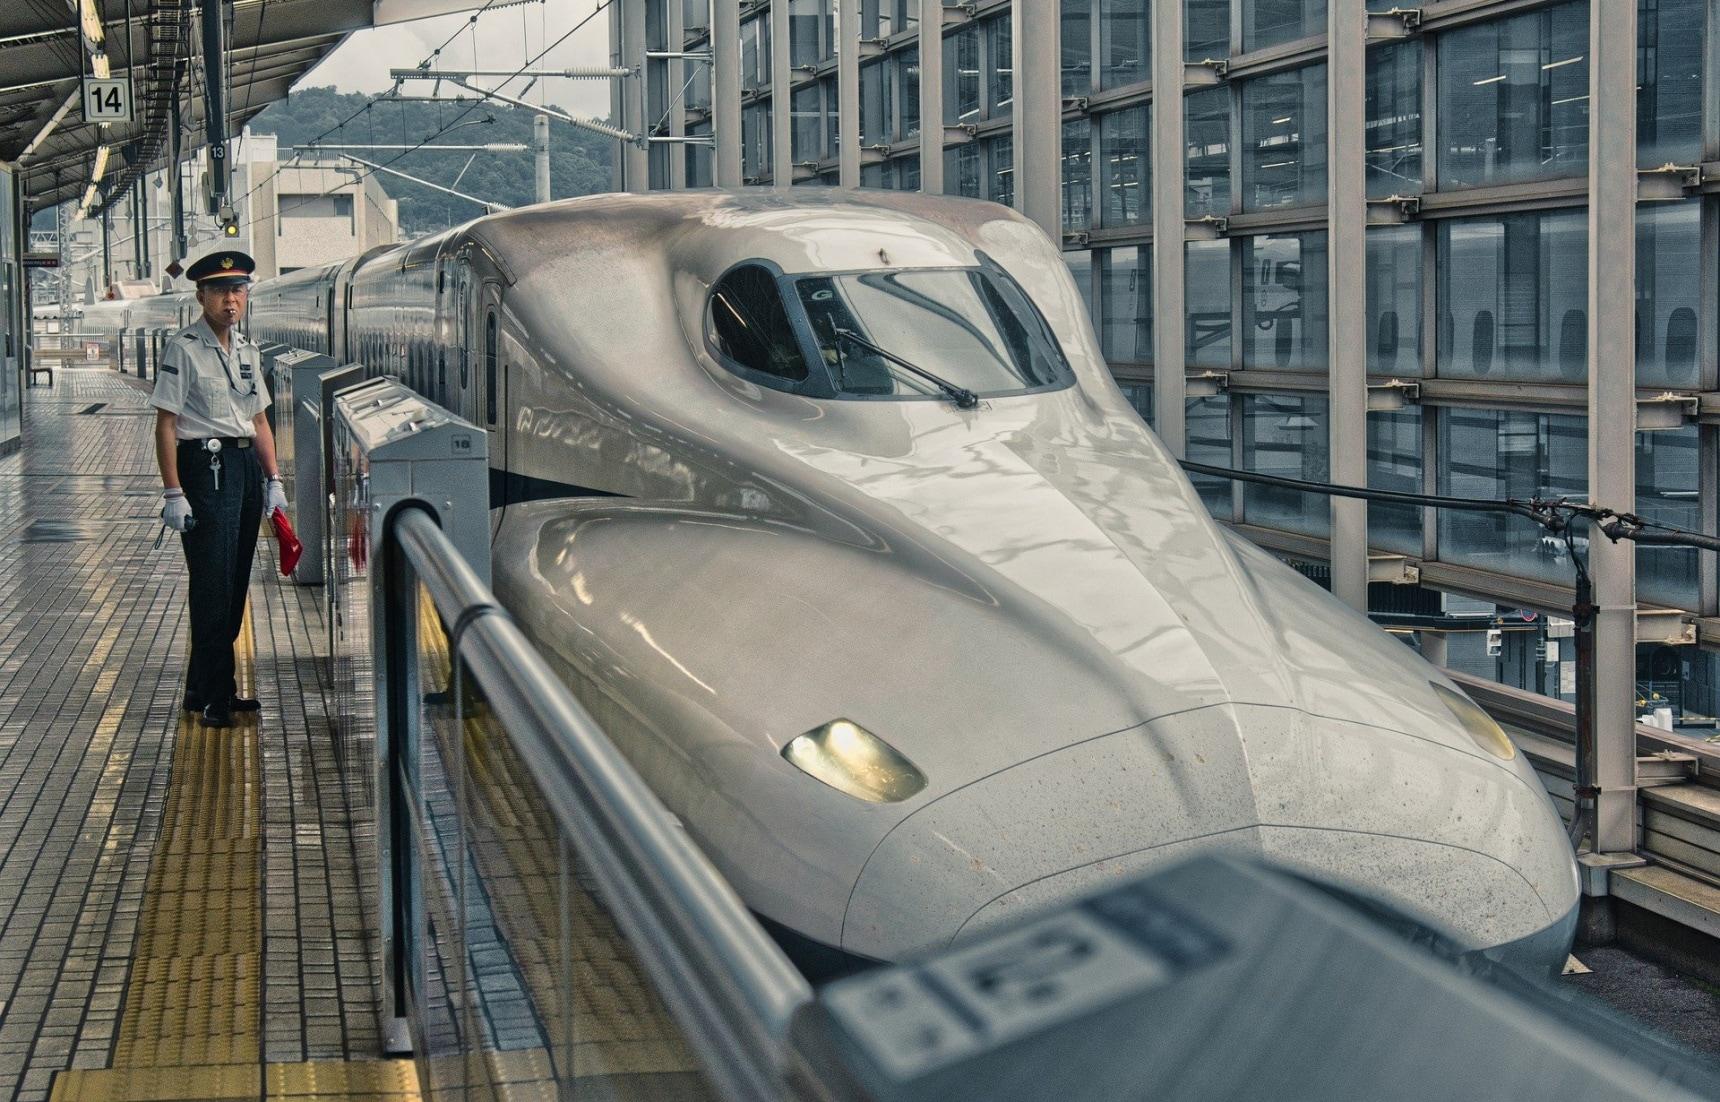 JR East to Offer Half-Price Shinkansen Tickets